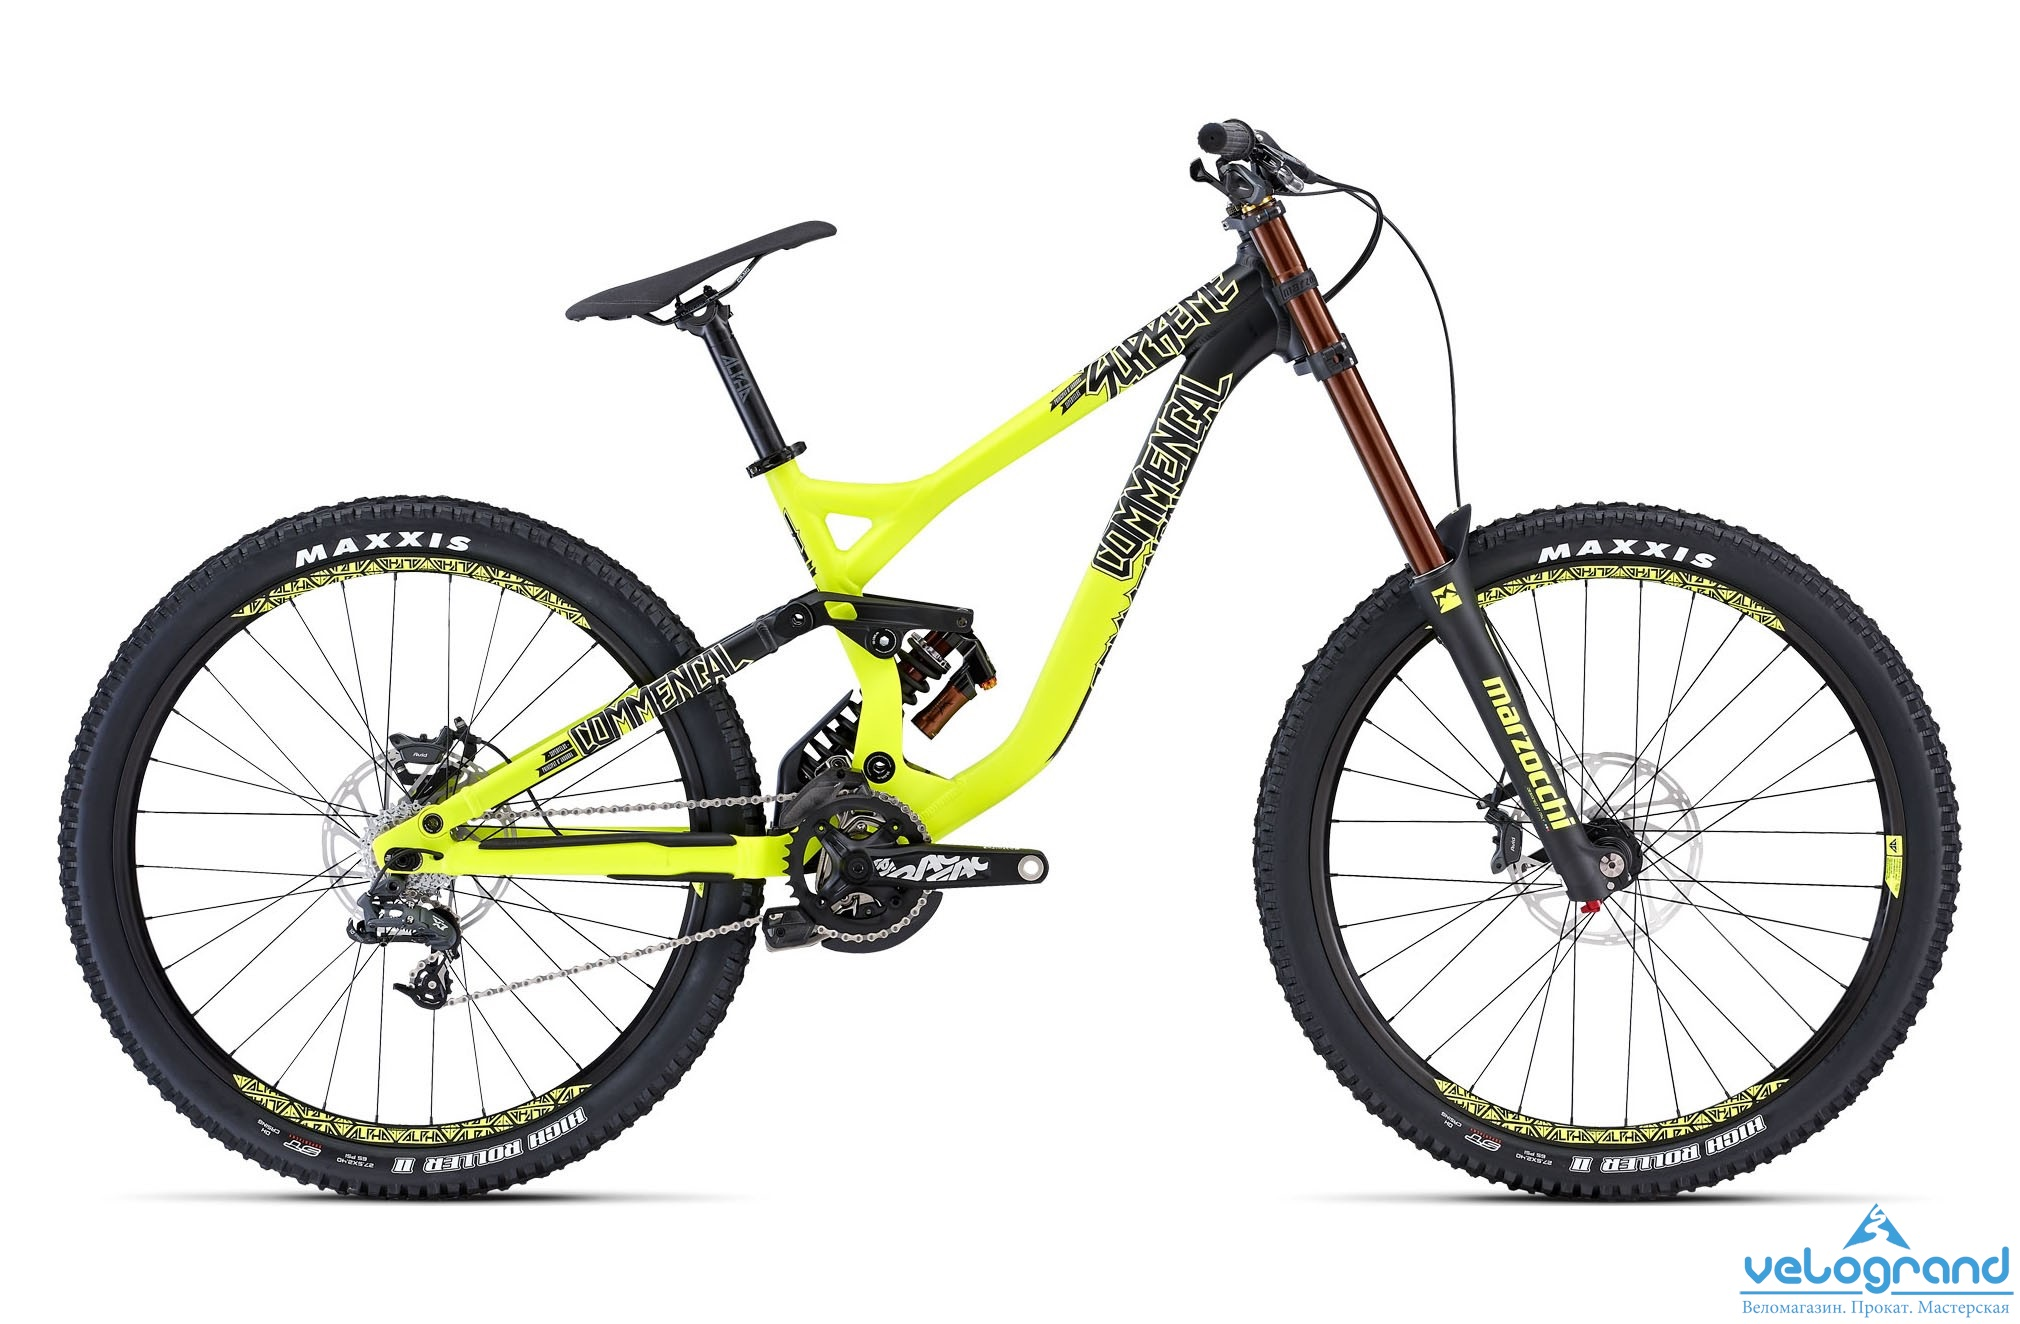 Велосипед двухподвес Commencal Supreme DH ORIGIN 650b (2015) от Velogrand